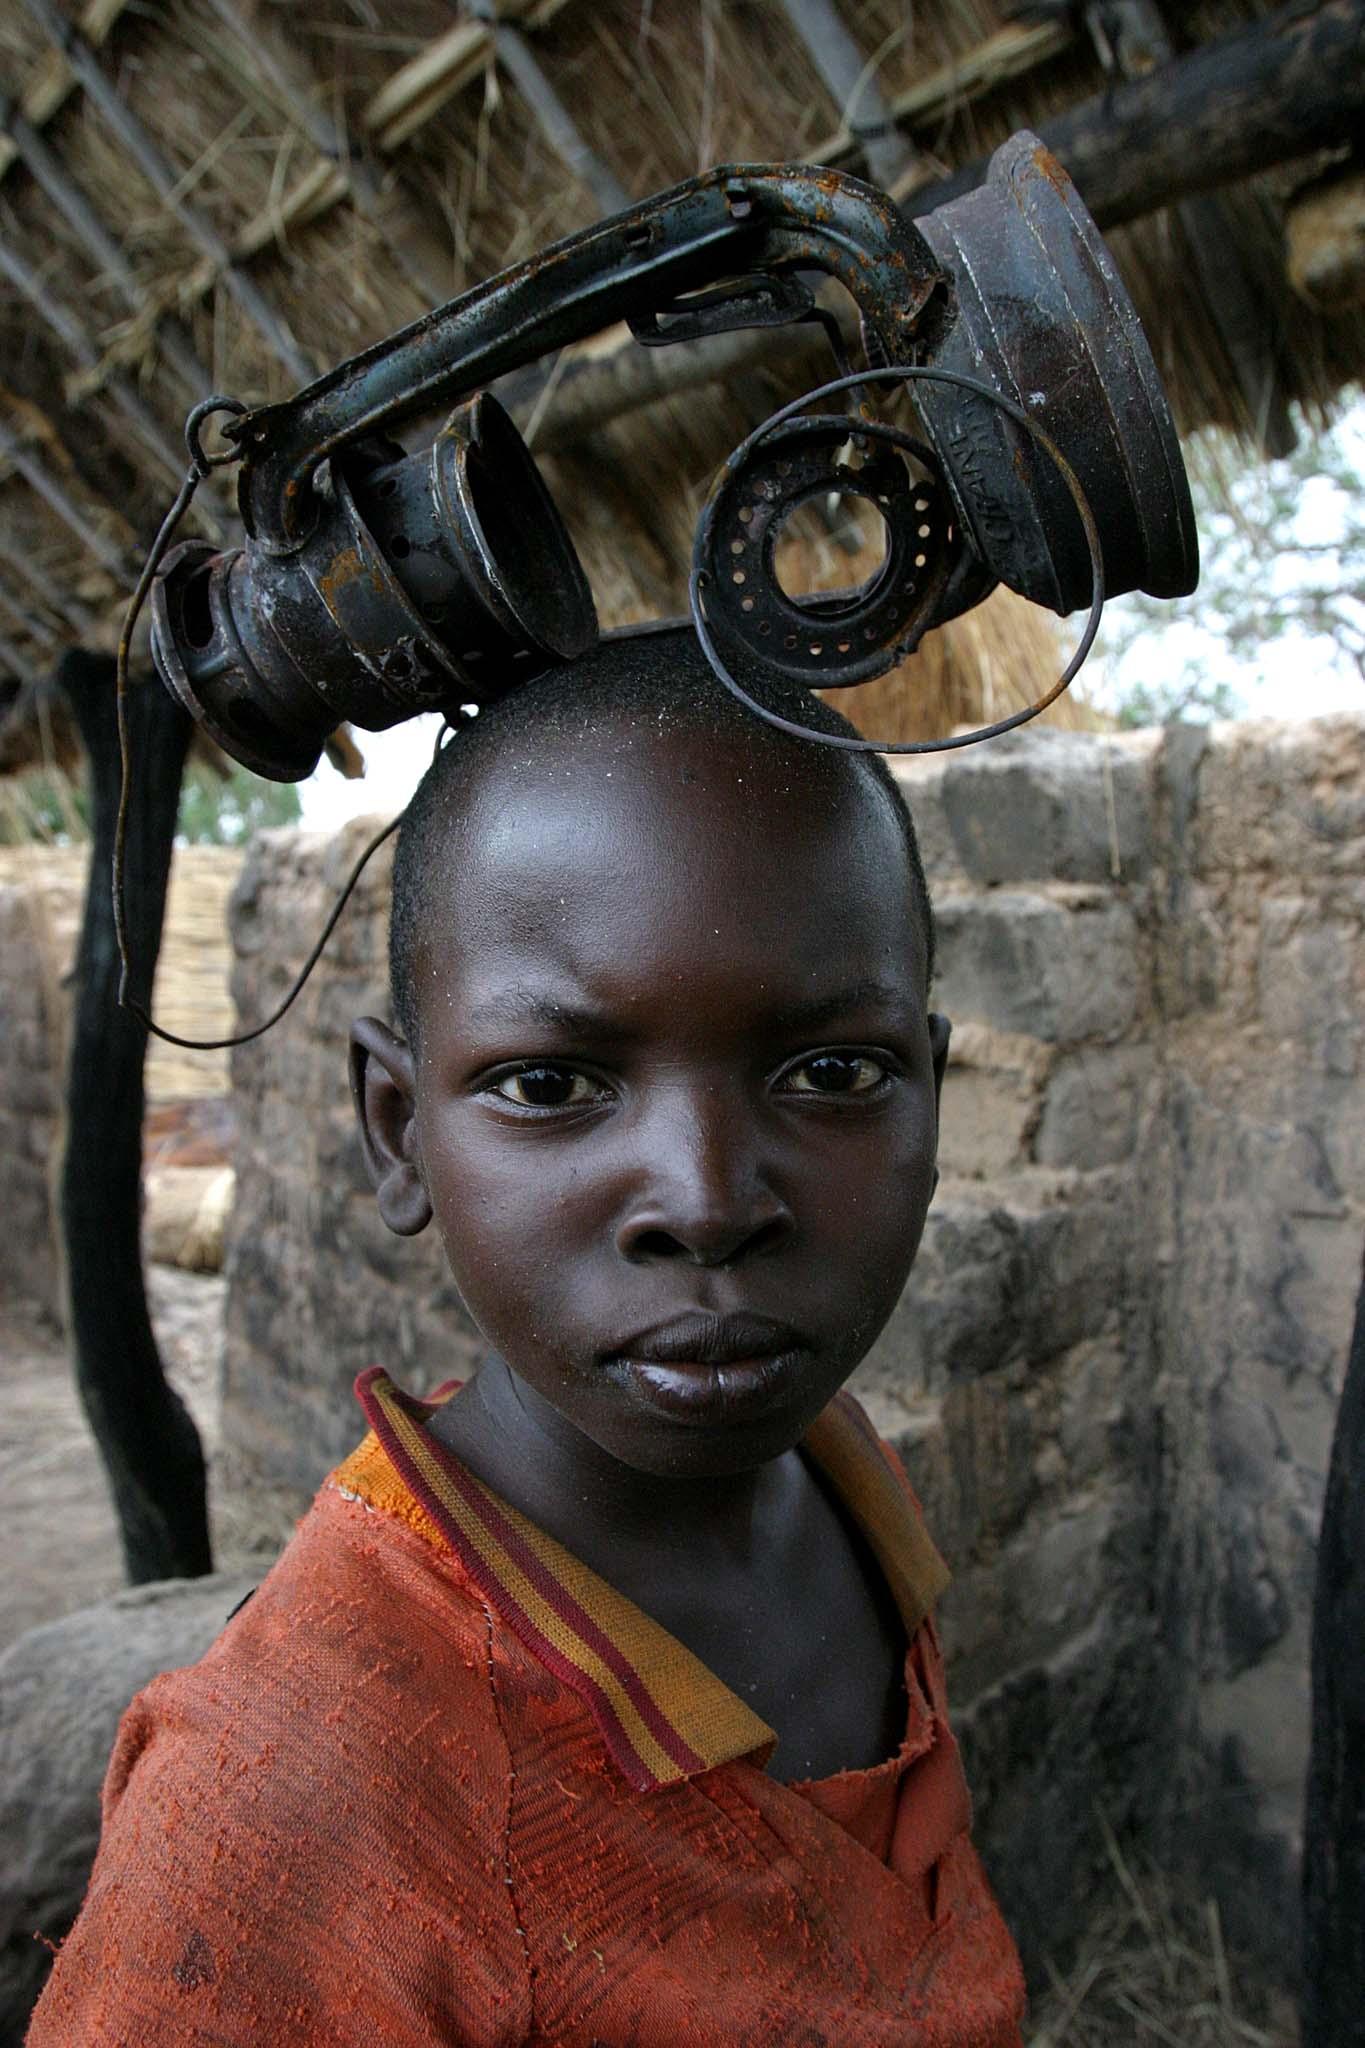 Central_African_Republic_-_Boy_in_Birao.jpg